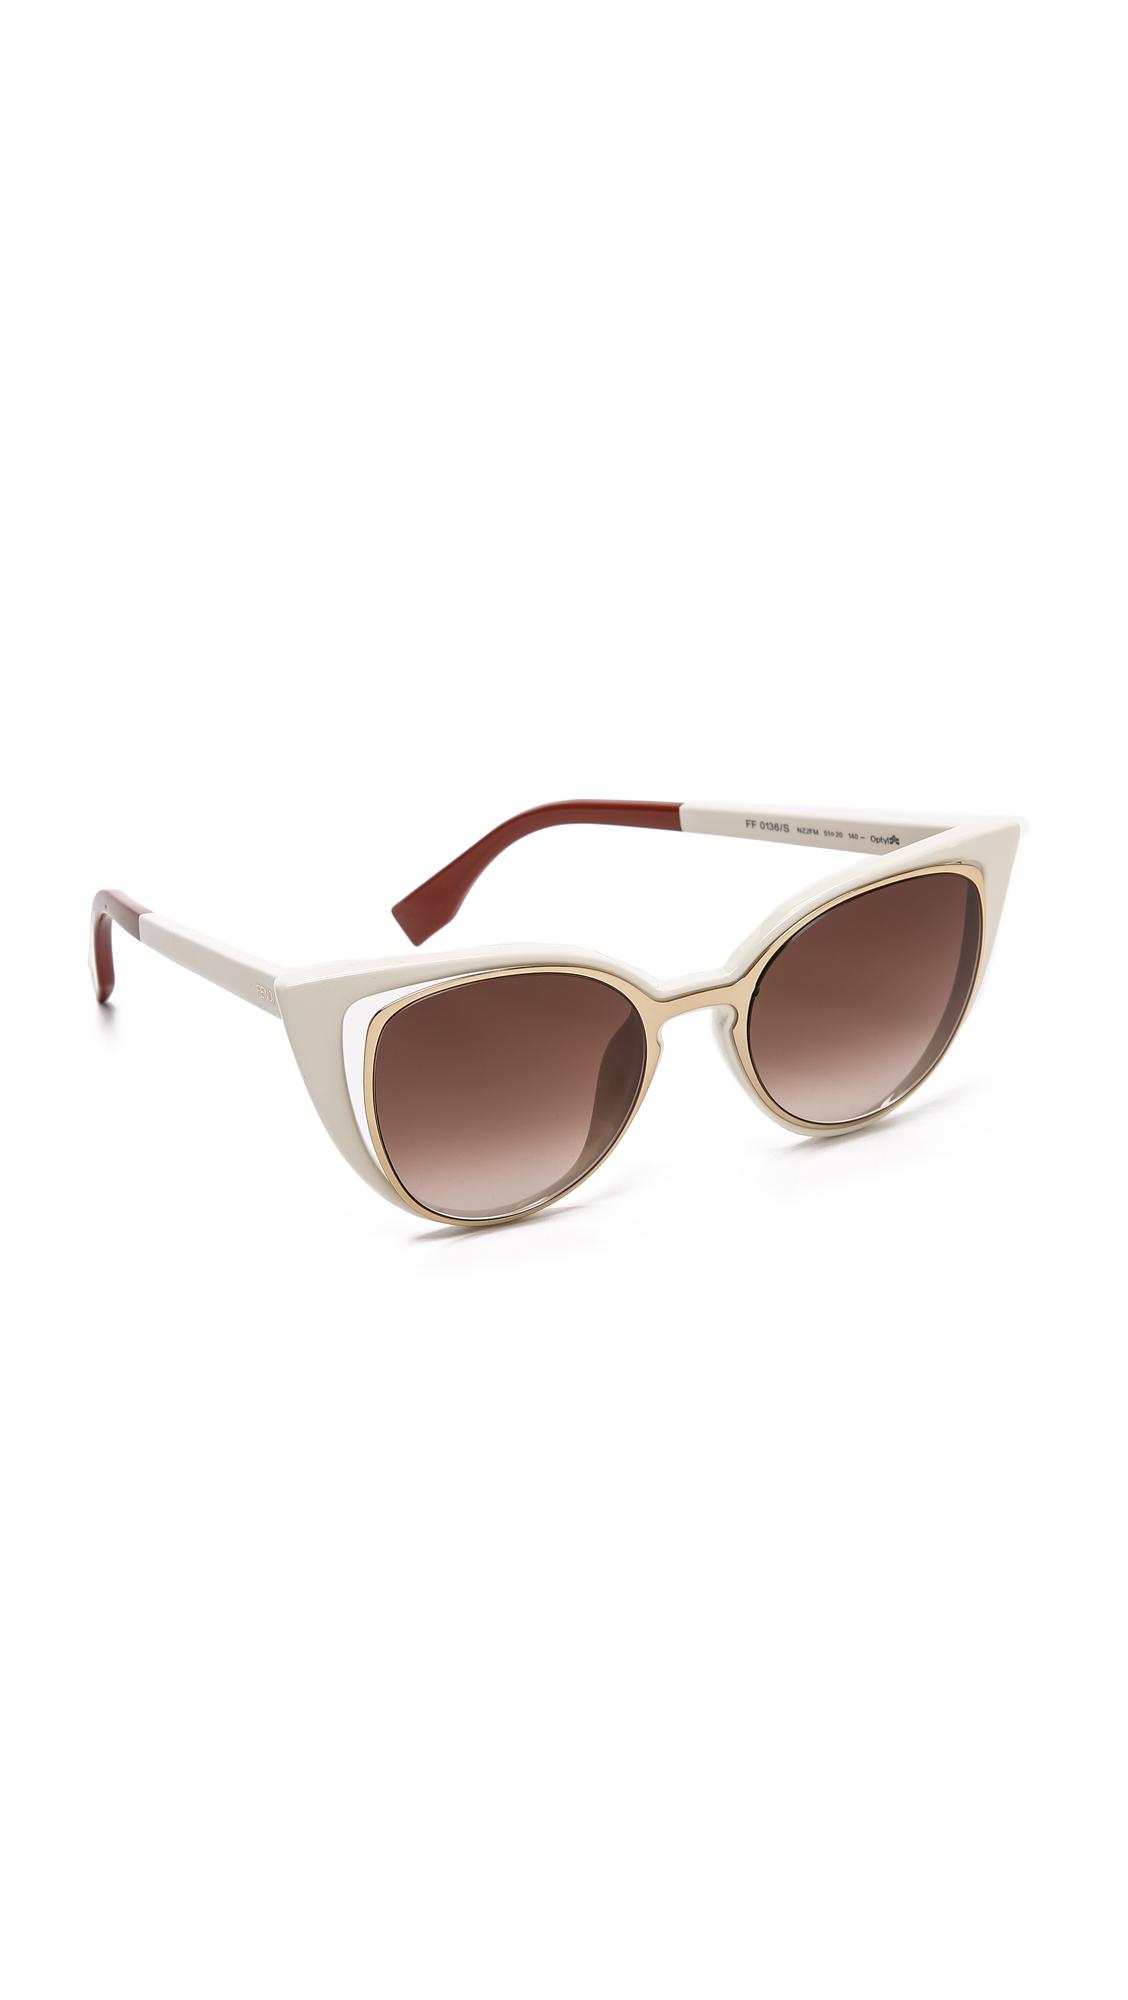 42d8d6da3e2bc Fendi Cutout Cat Eye Sunglasses - Gold White brown Shade in Metallic ...